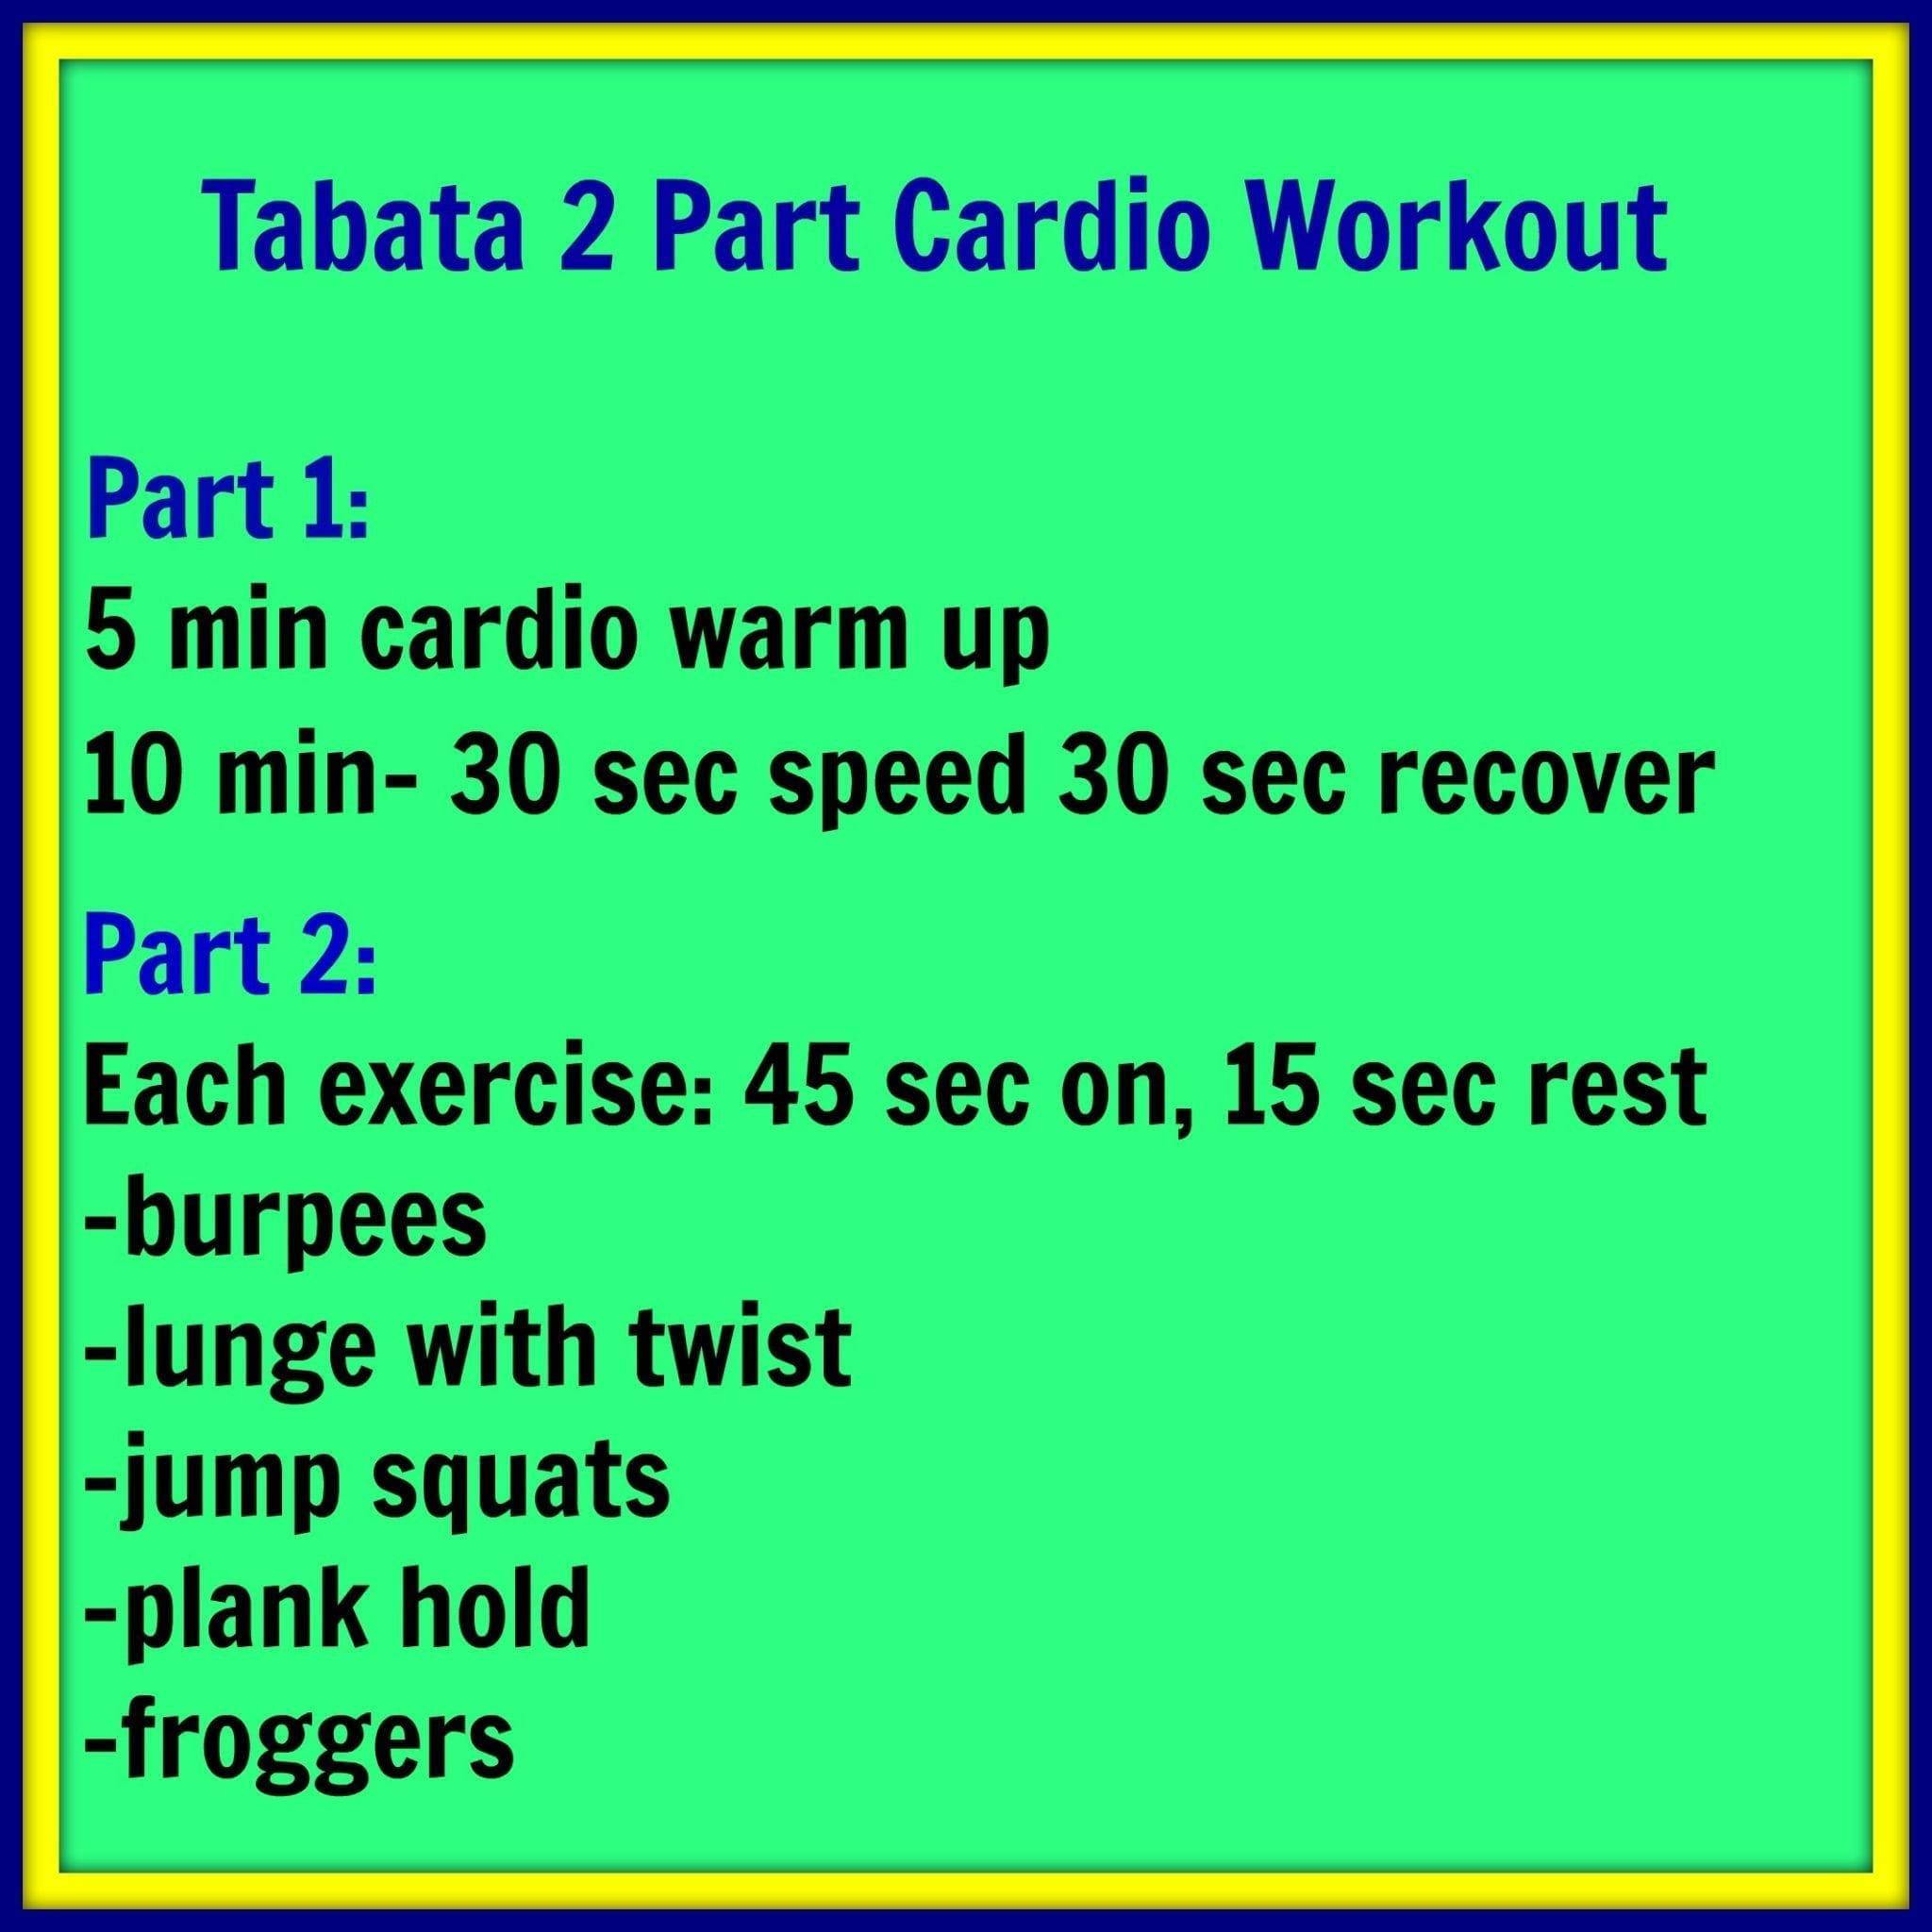 tabata 2 part cardio workout